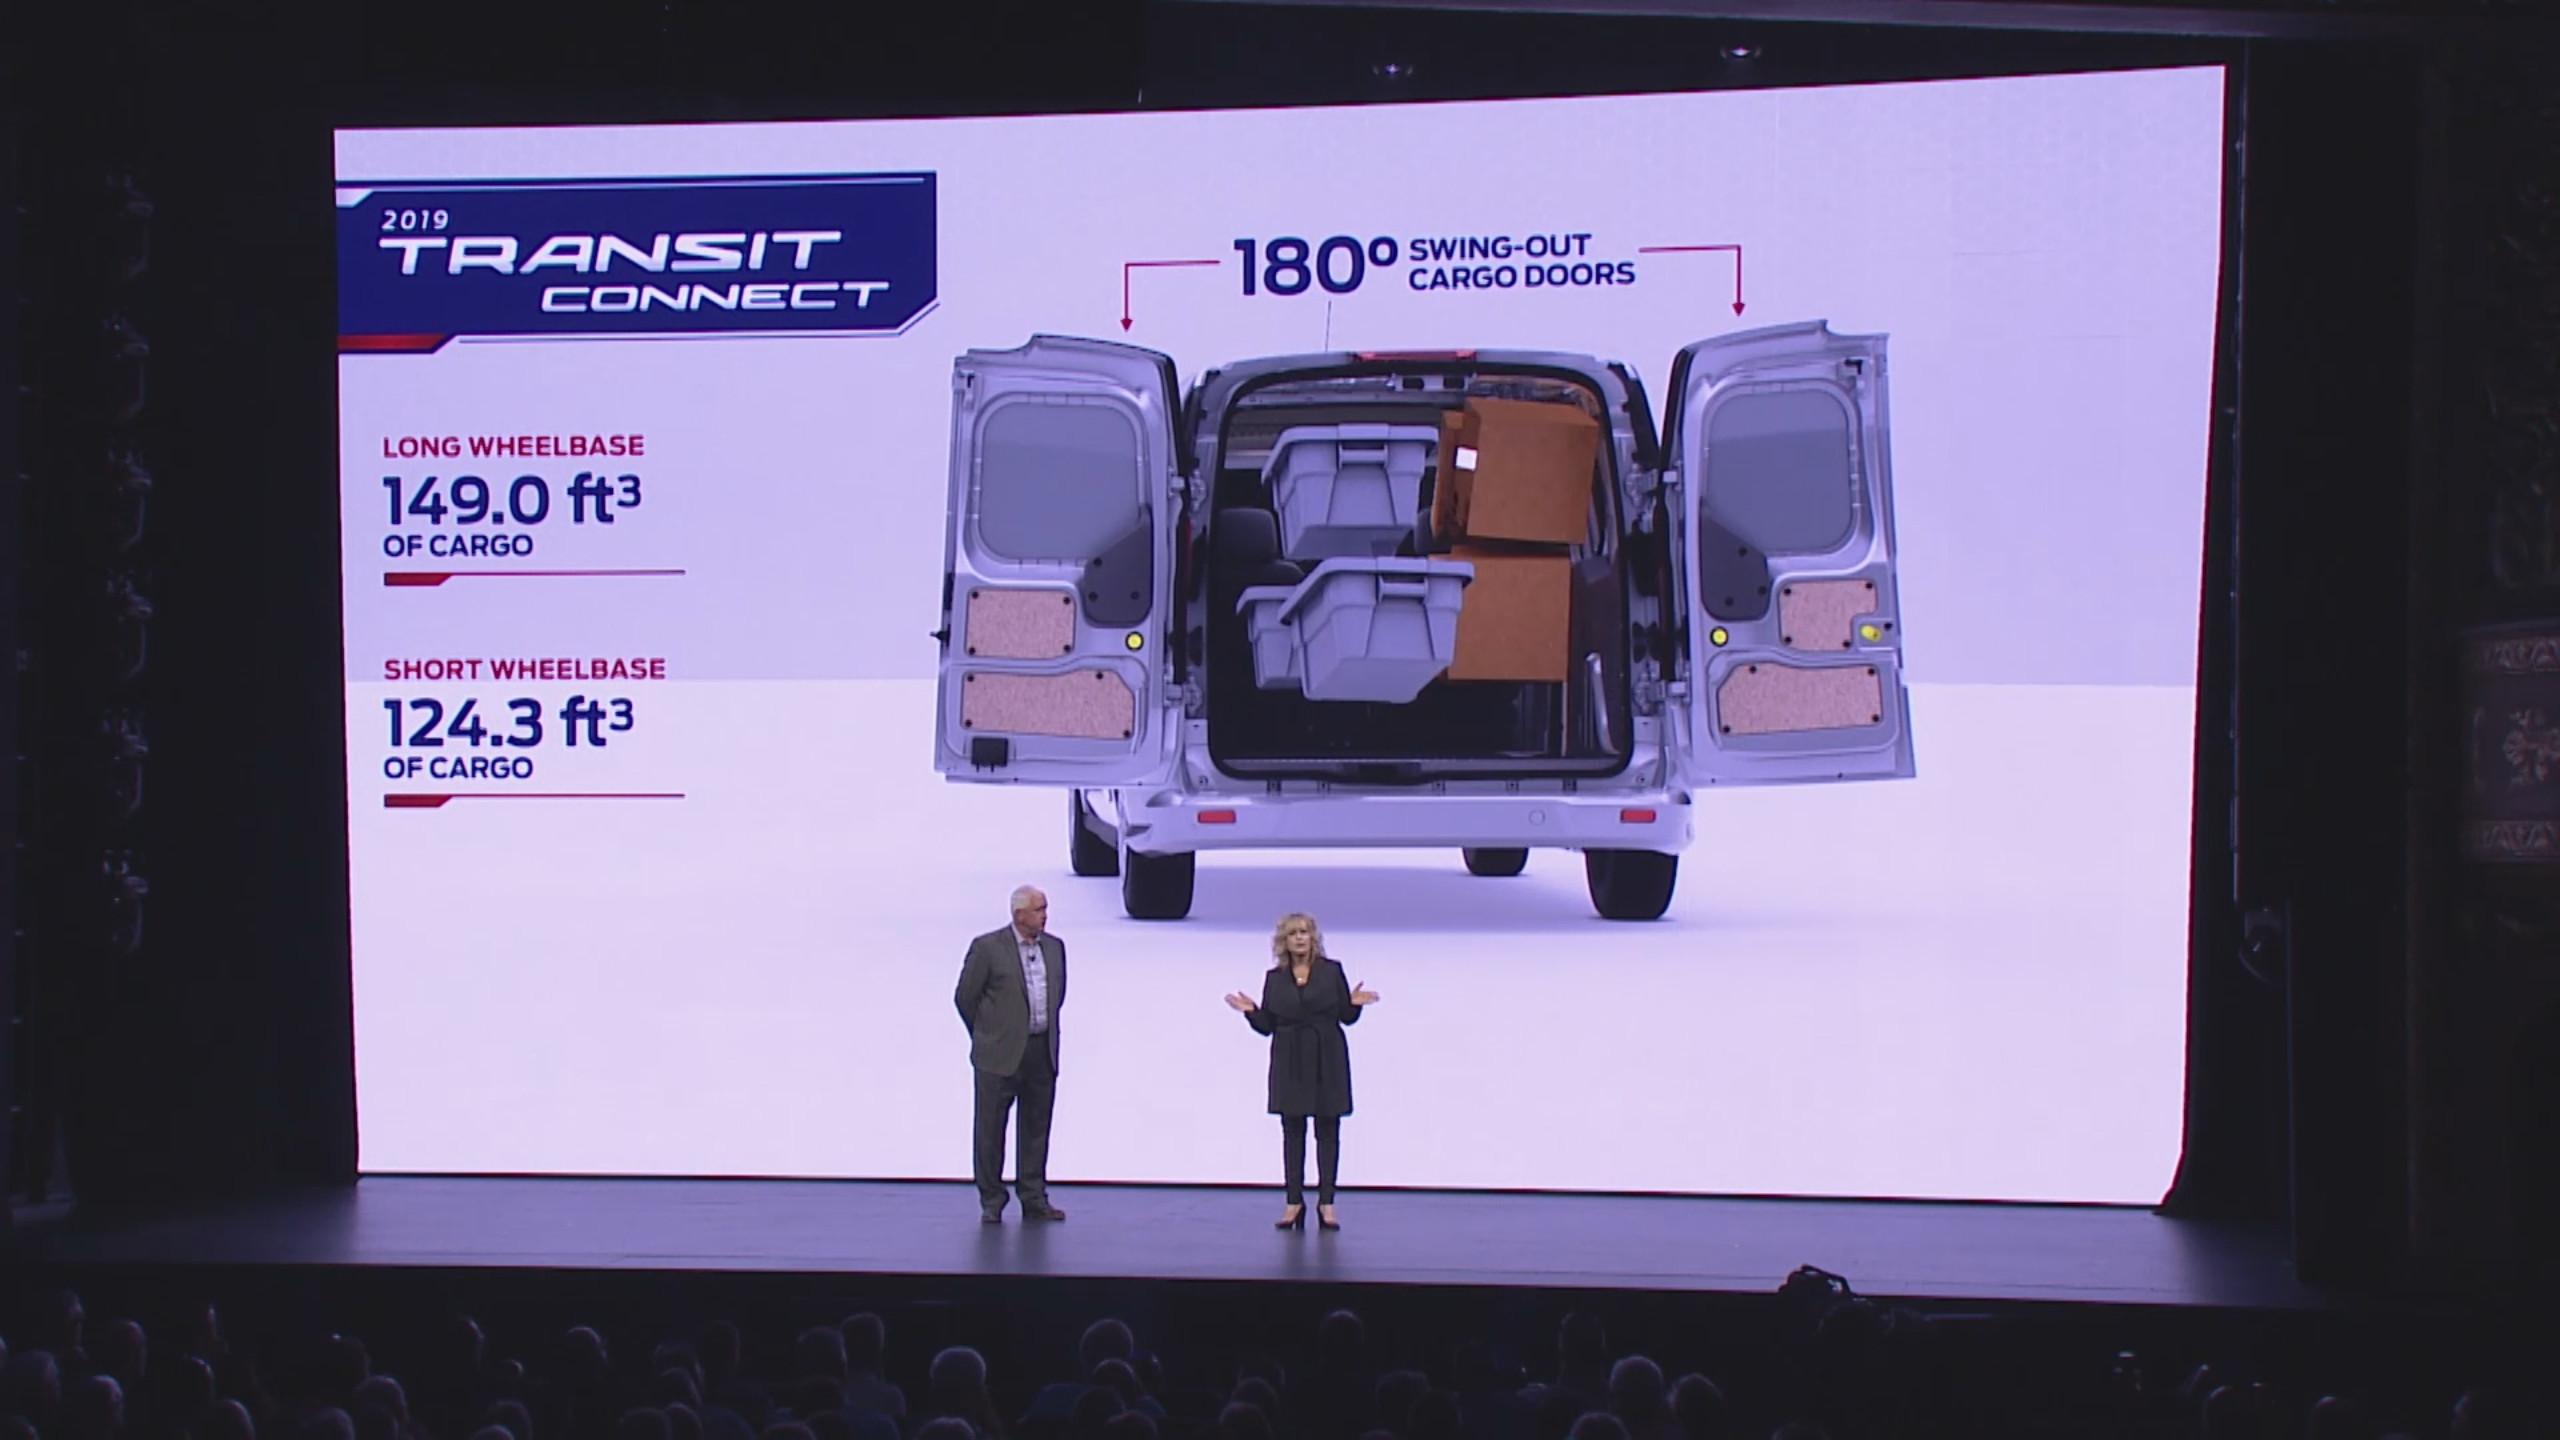 2019 Ford Transit Connect Live Presentation